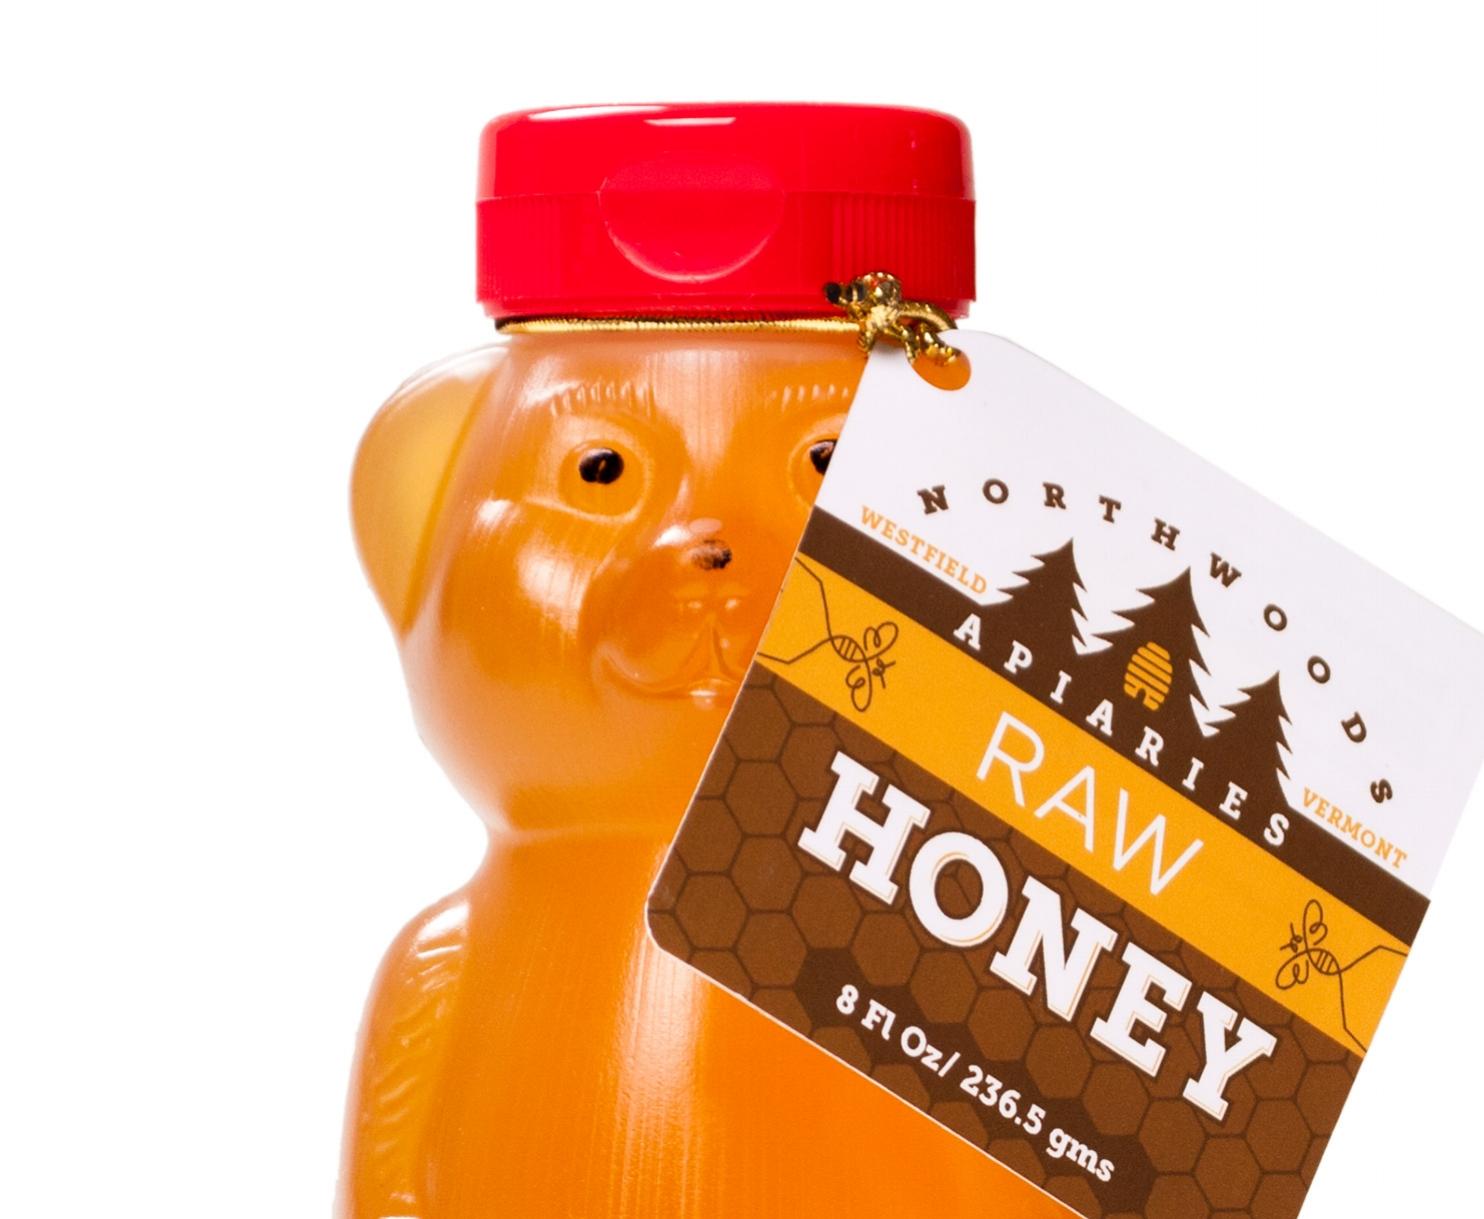 Northwoods Apiaries Honey Bear